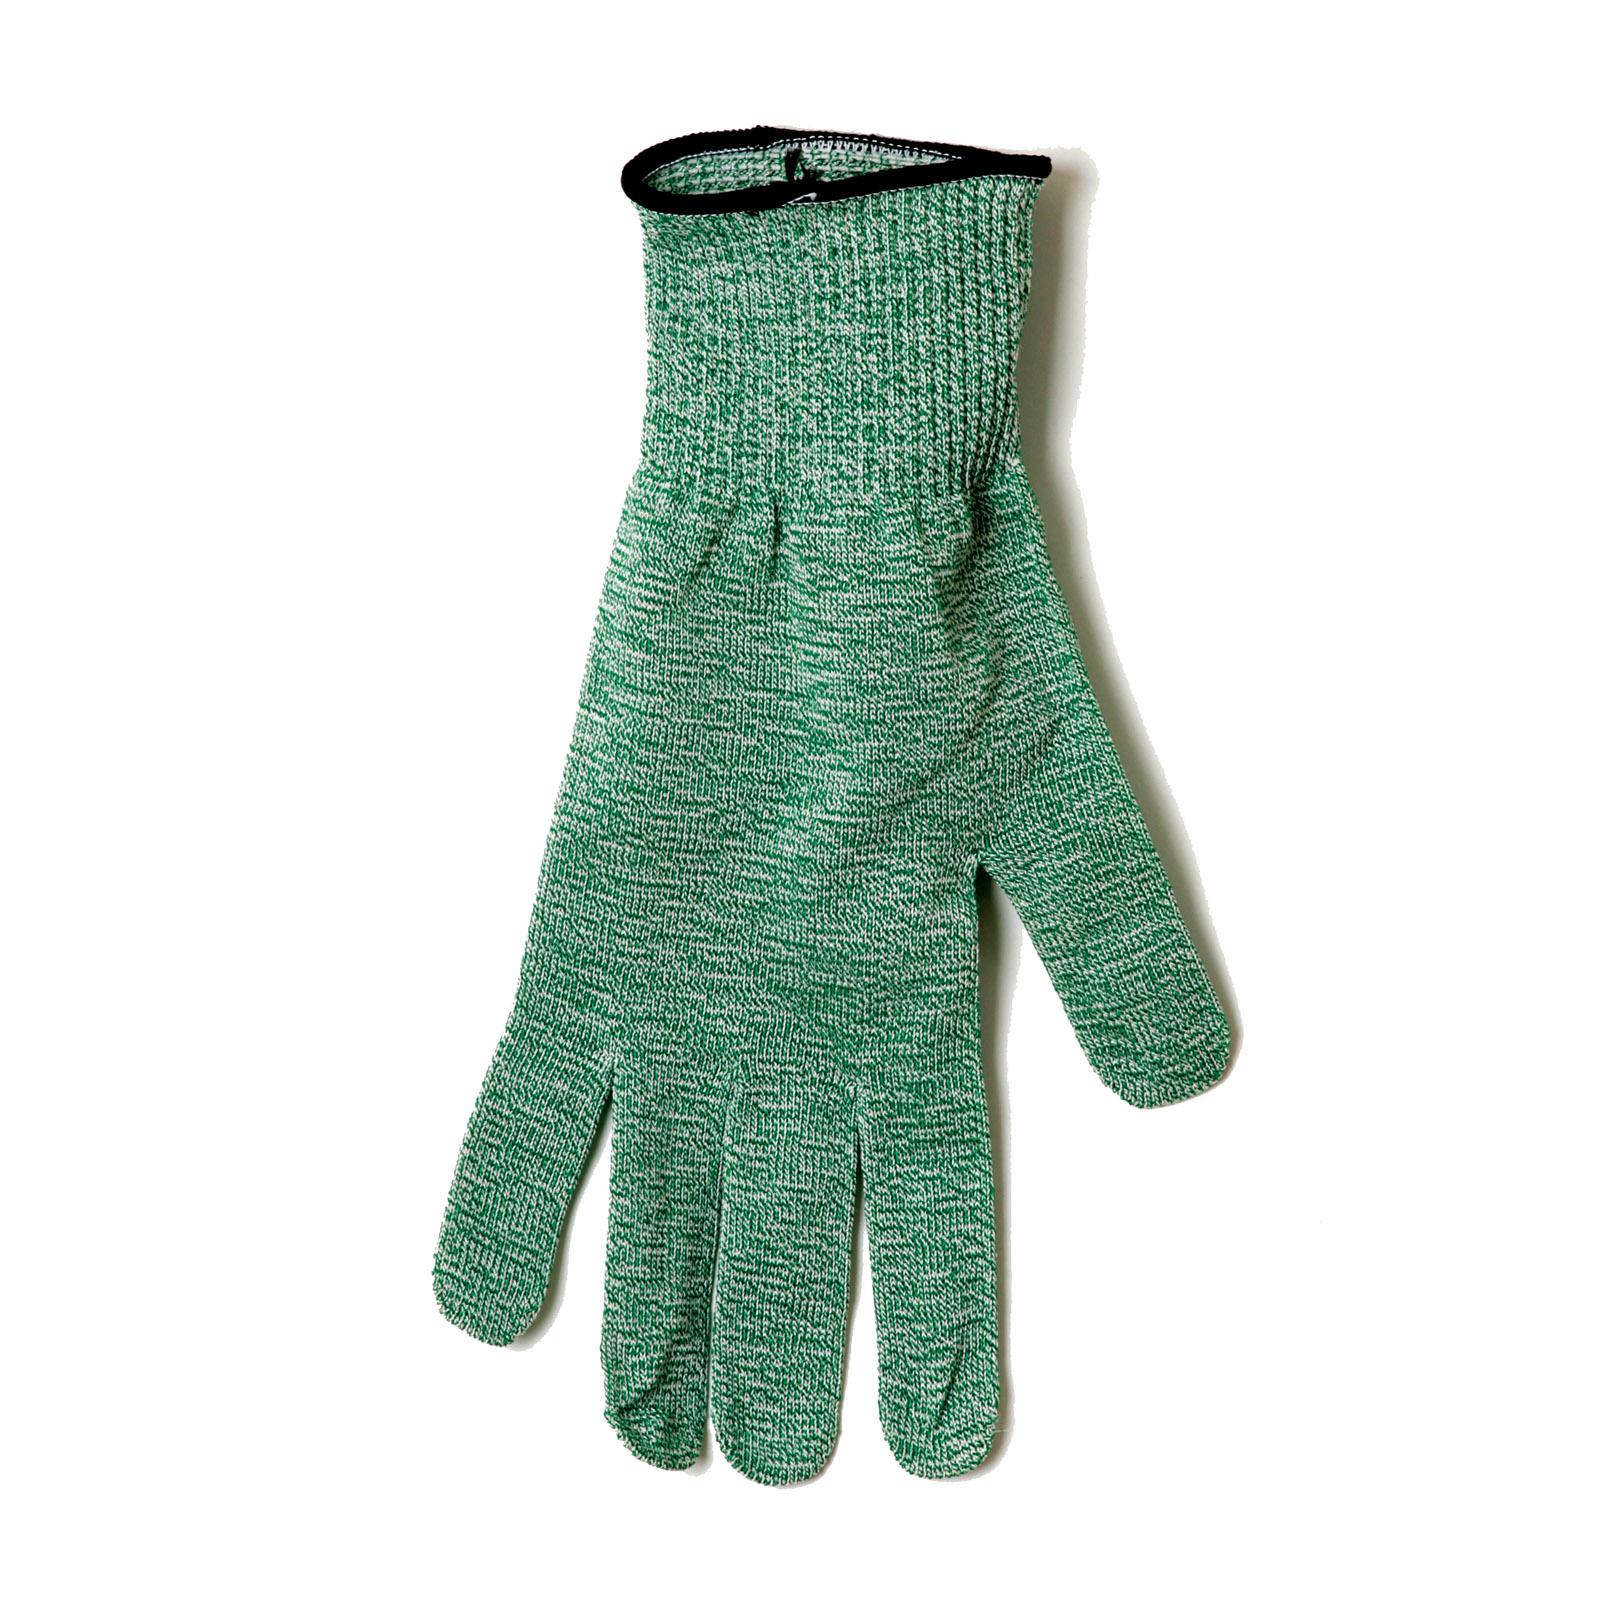 San Jamar SG10-GN-S glove, cut resistant